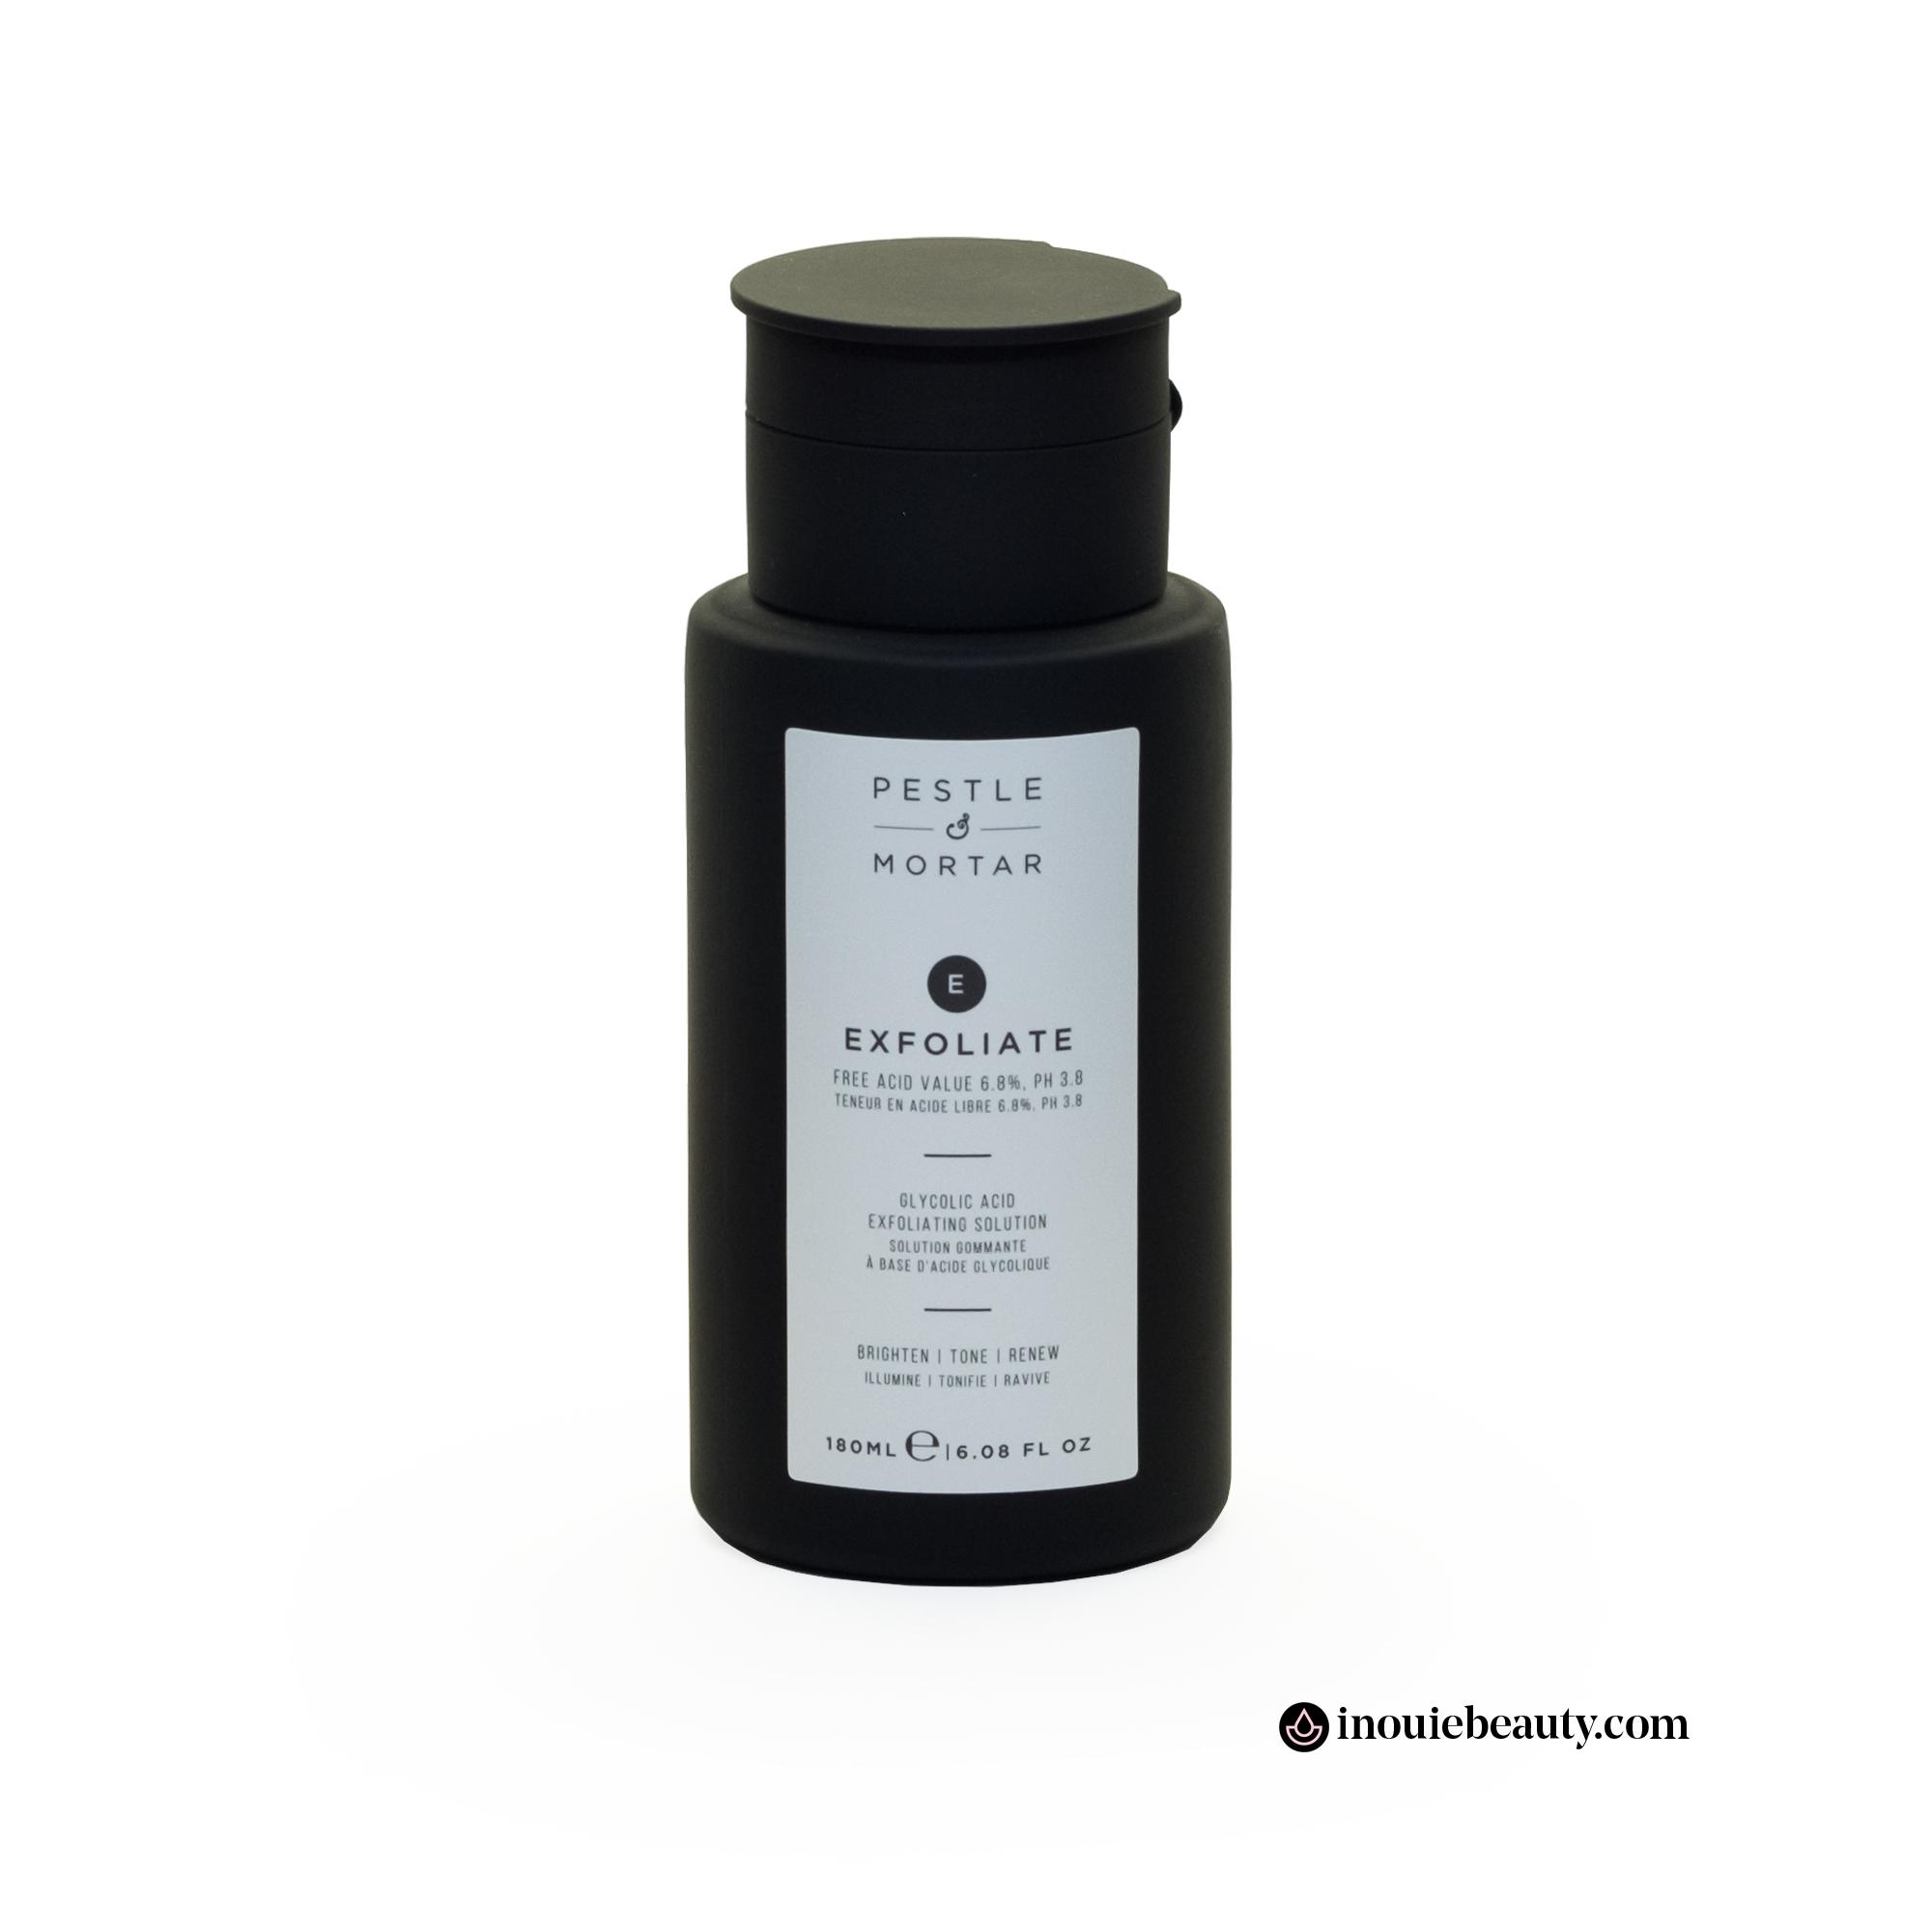 Pestle & Mortar Exfoliate Glycolic Acid Toner